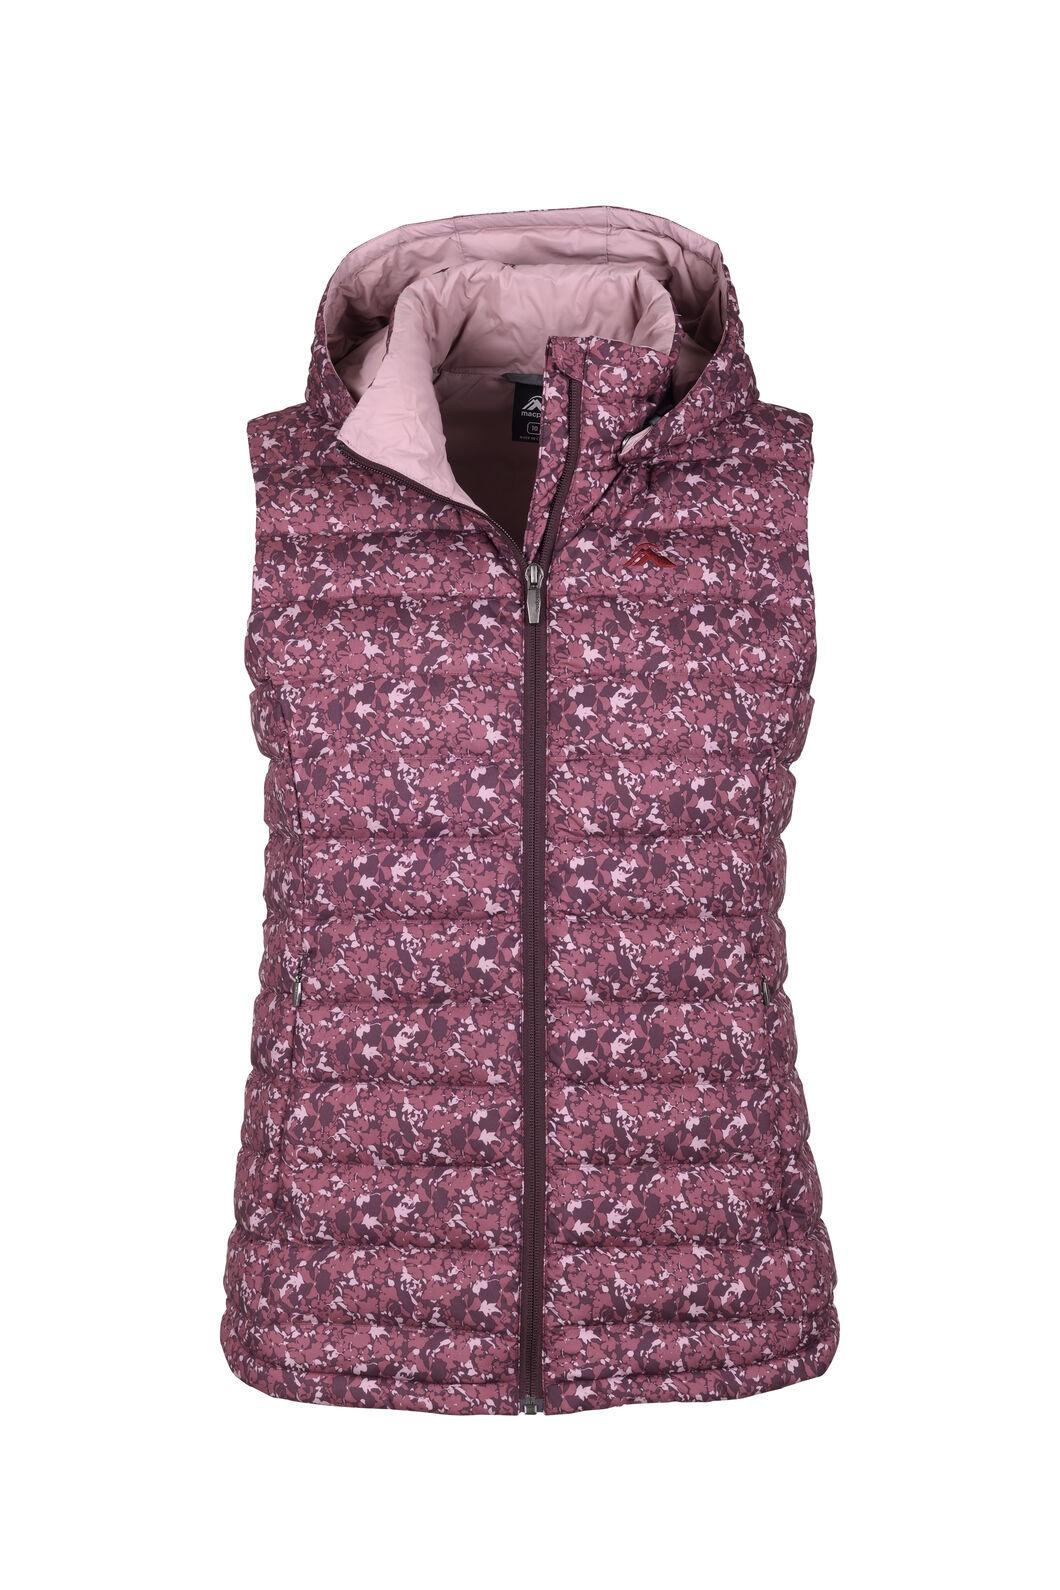 Macpac Women's Zodiac Hooded Down Vest, Fudge/Woodrose, hi-res